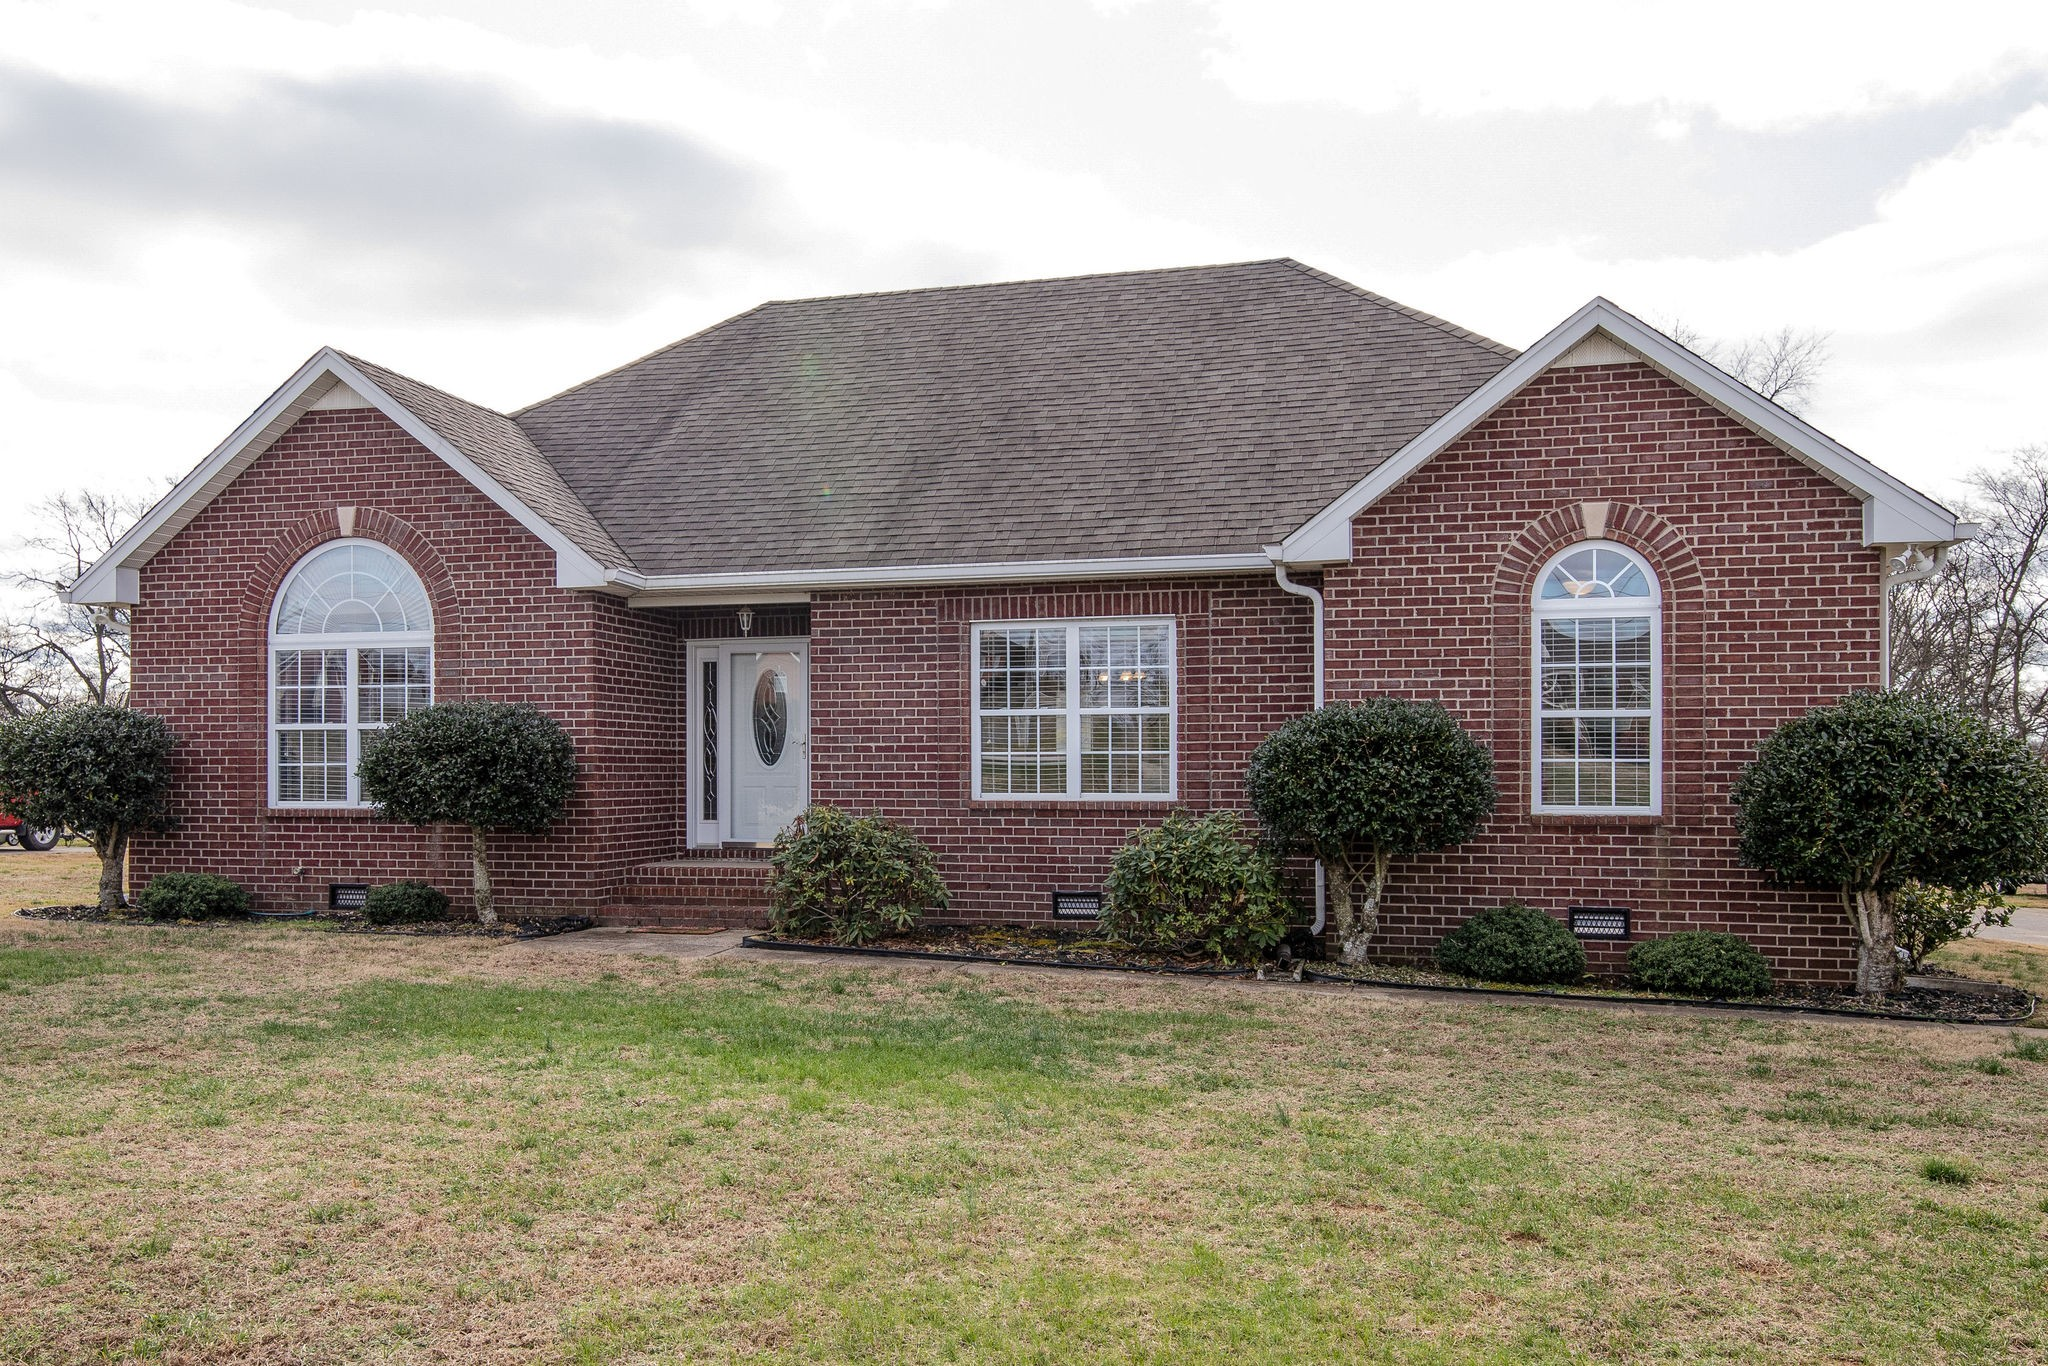 1031 Emerald Way, Castalian Springs, TN 37031 - Castalian Springs, TN real estate listing